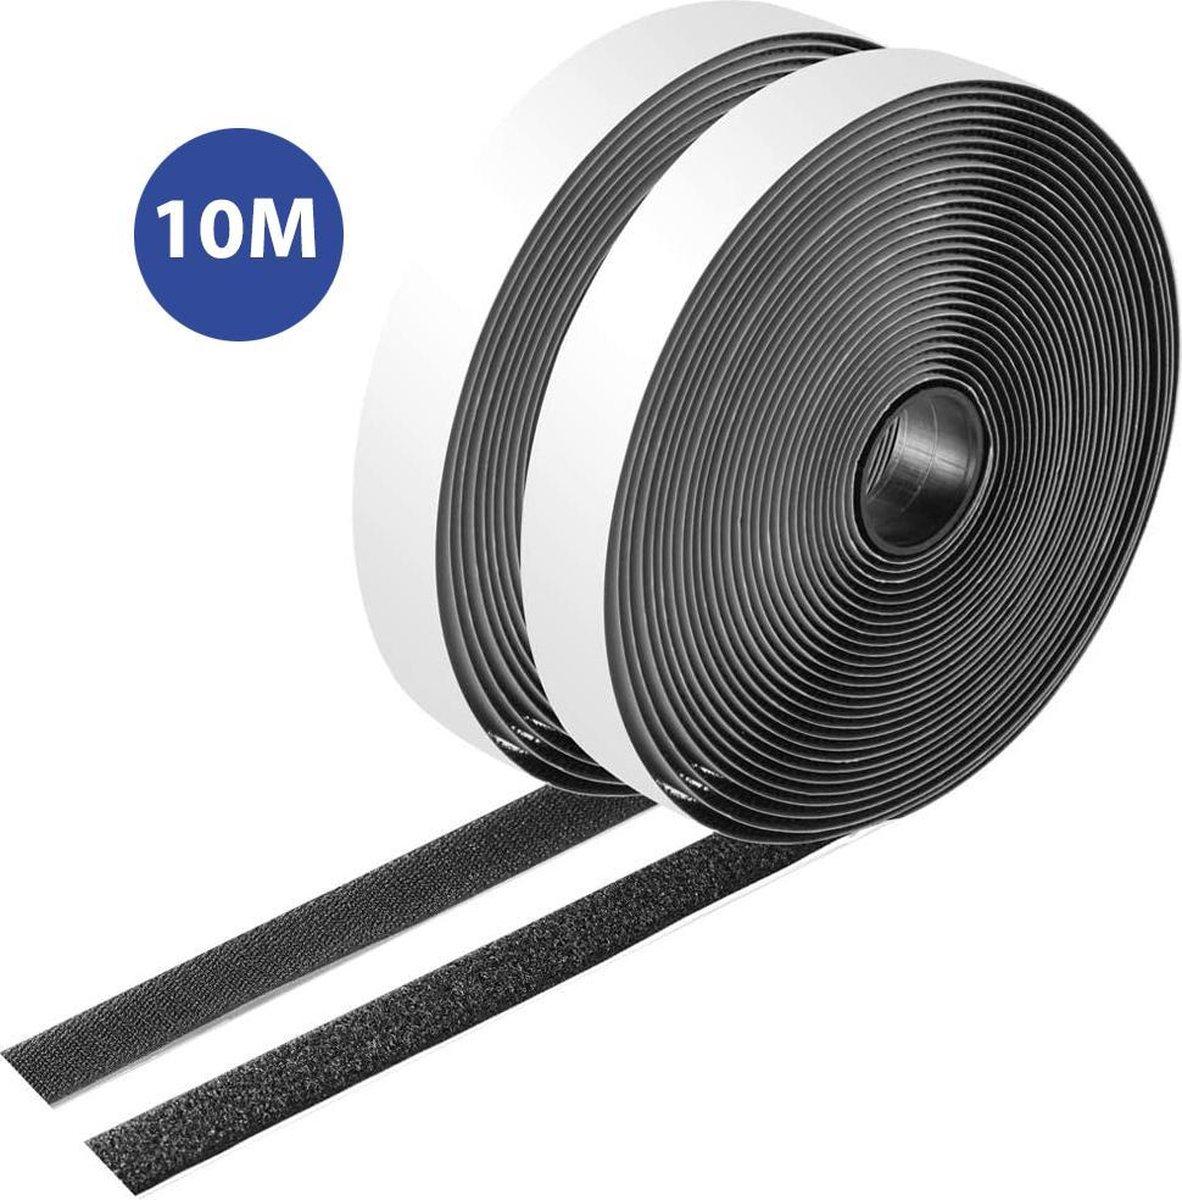 Simple Fix Klittenband - Klittenband Zelfklevend - Velcro - Dubbelzijdig Klittenband - Zwart - 10 Me